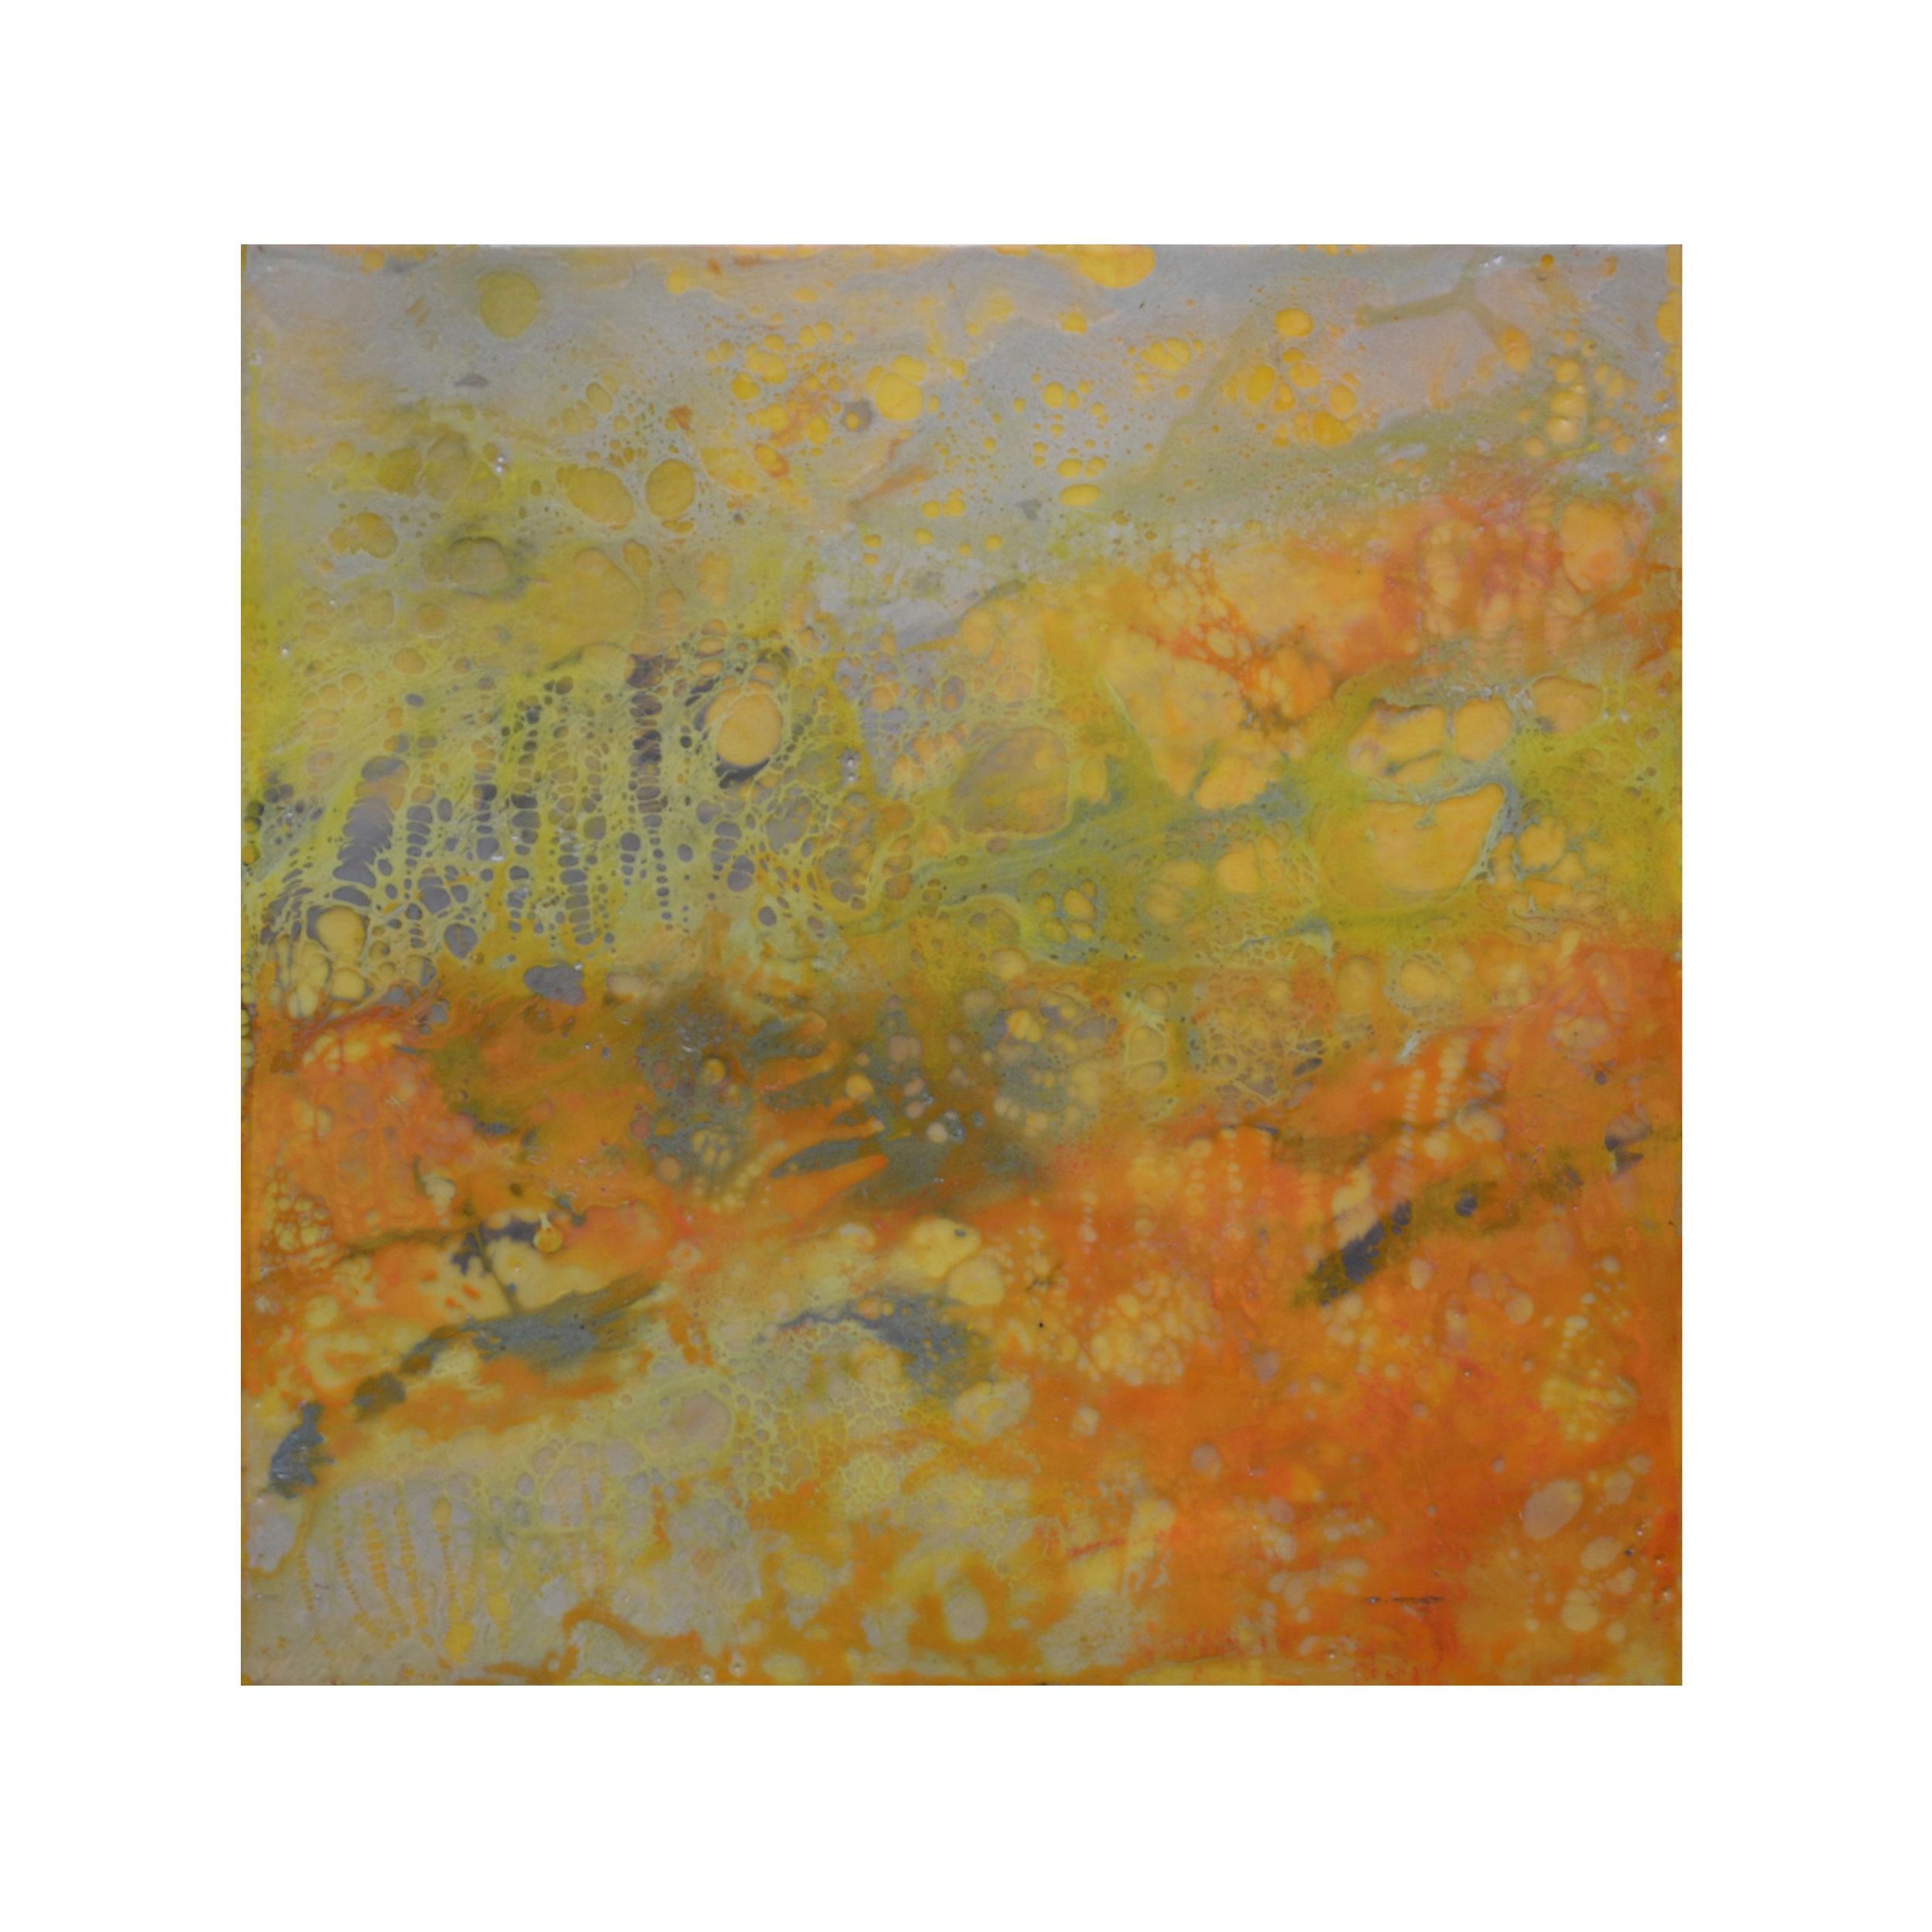 Amber Light   12 x 12  Encaustic on Panel  $300